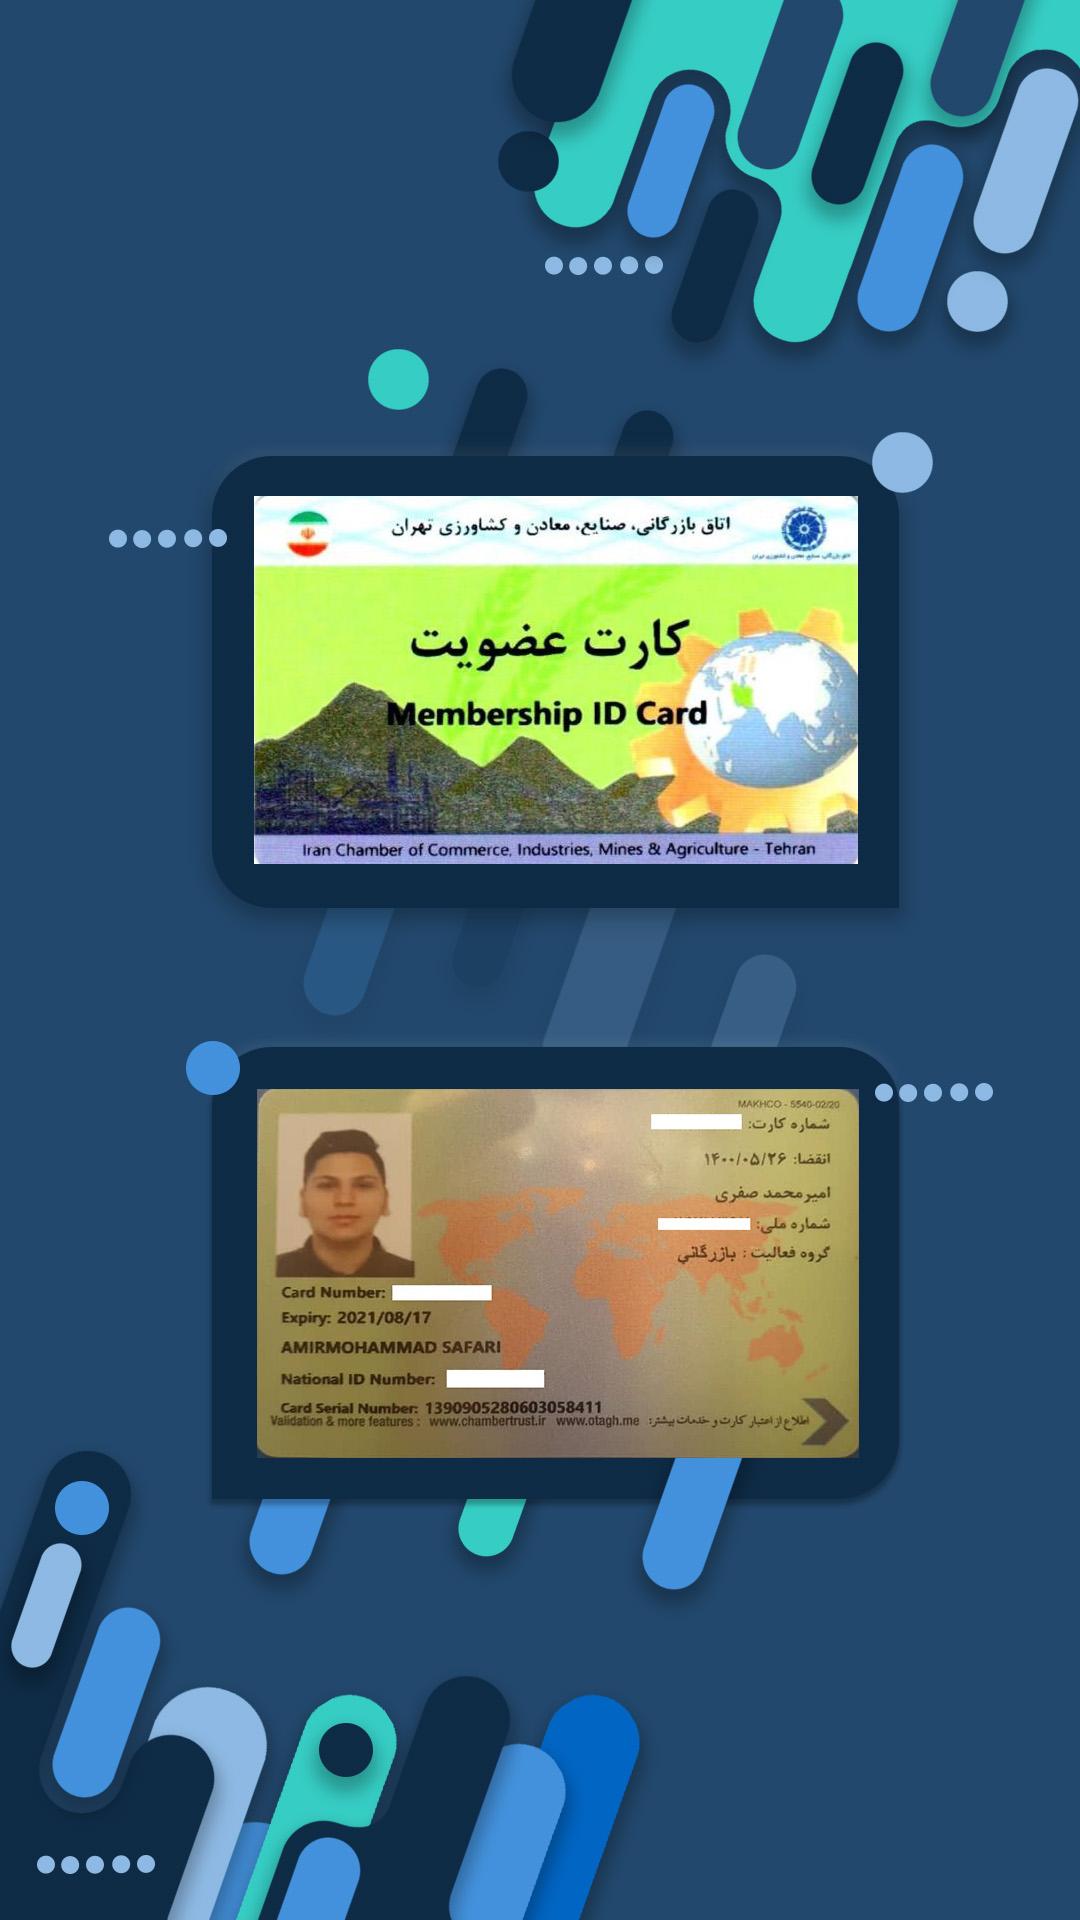 mahan-card-joind-.10-3999